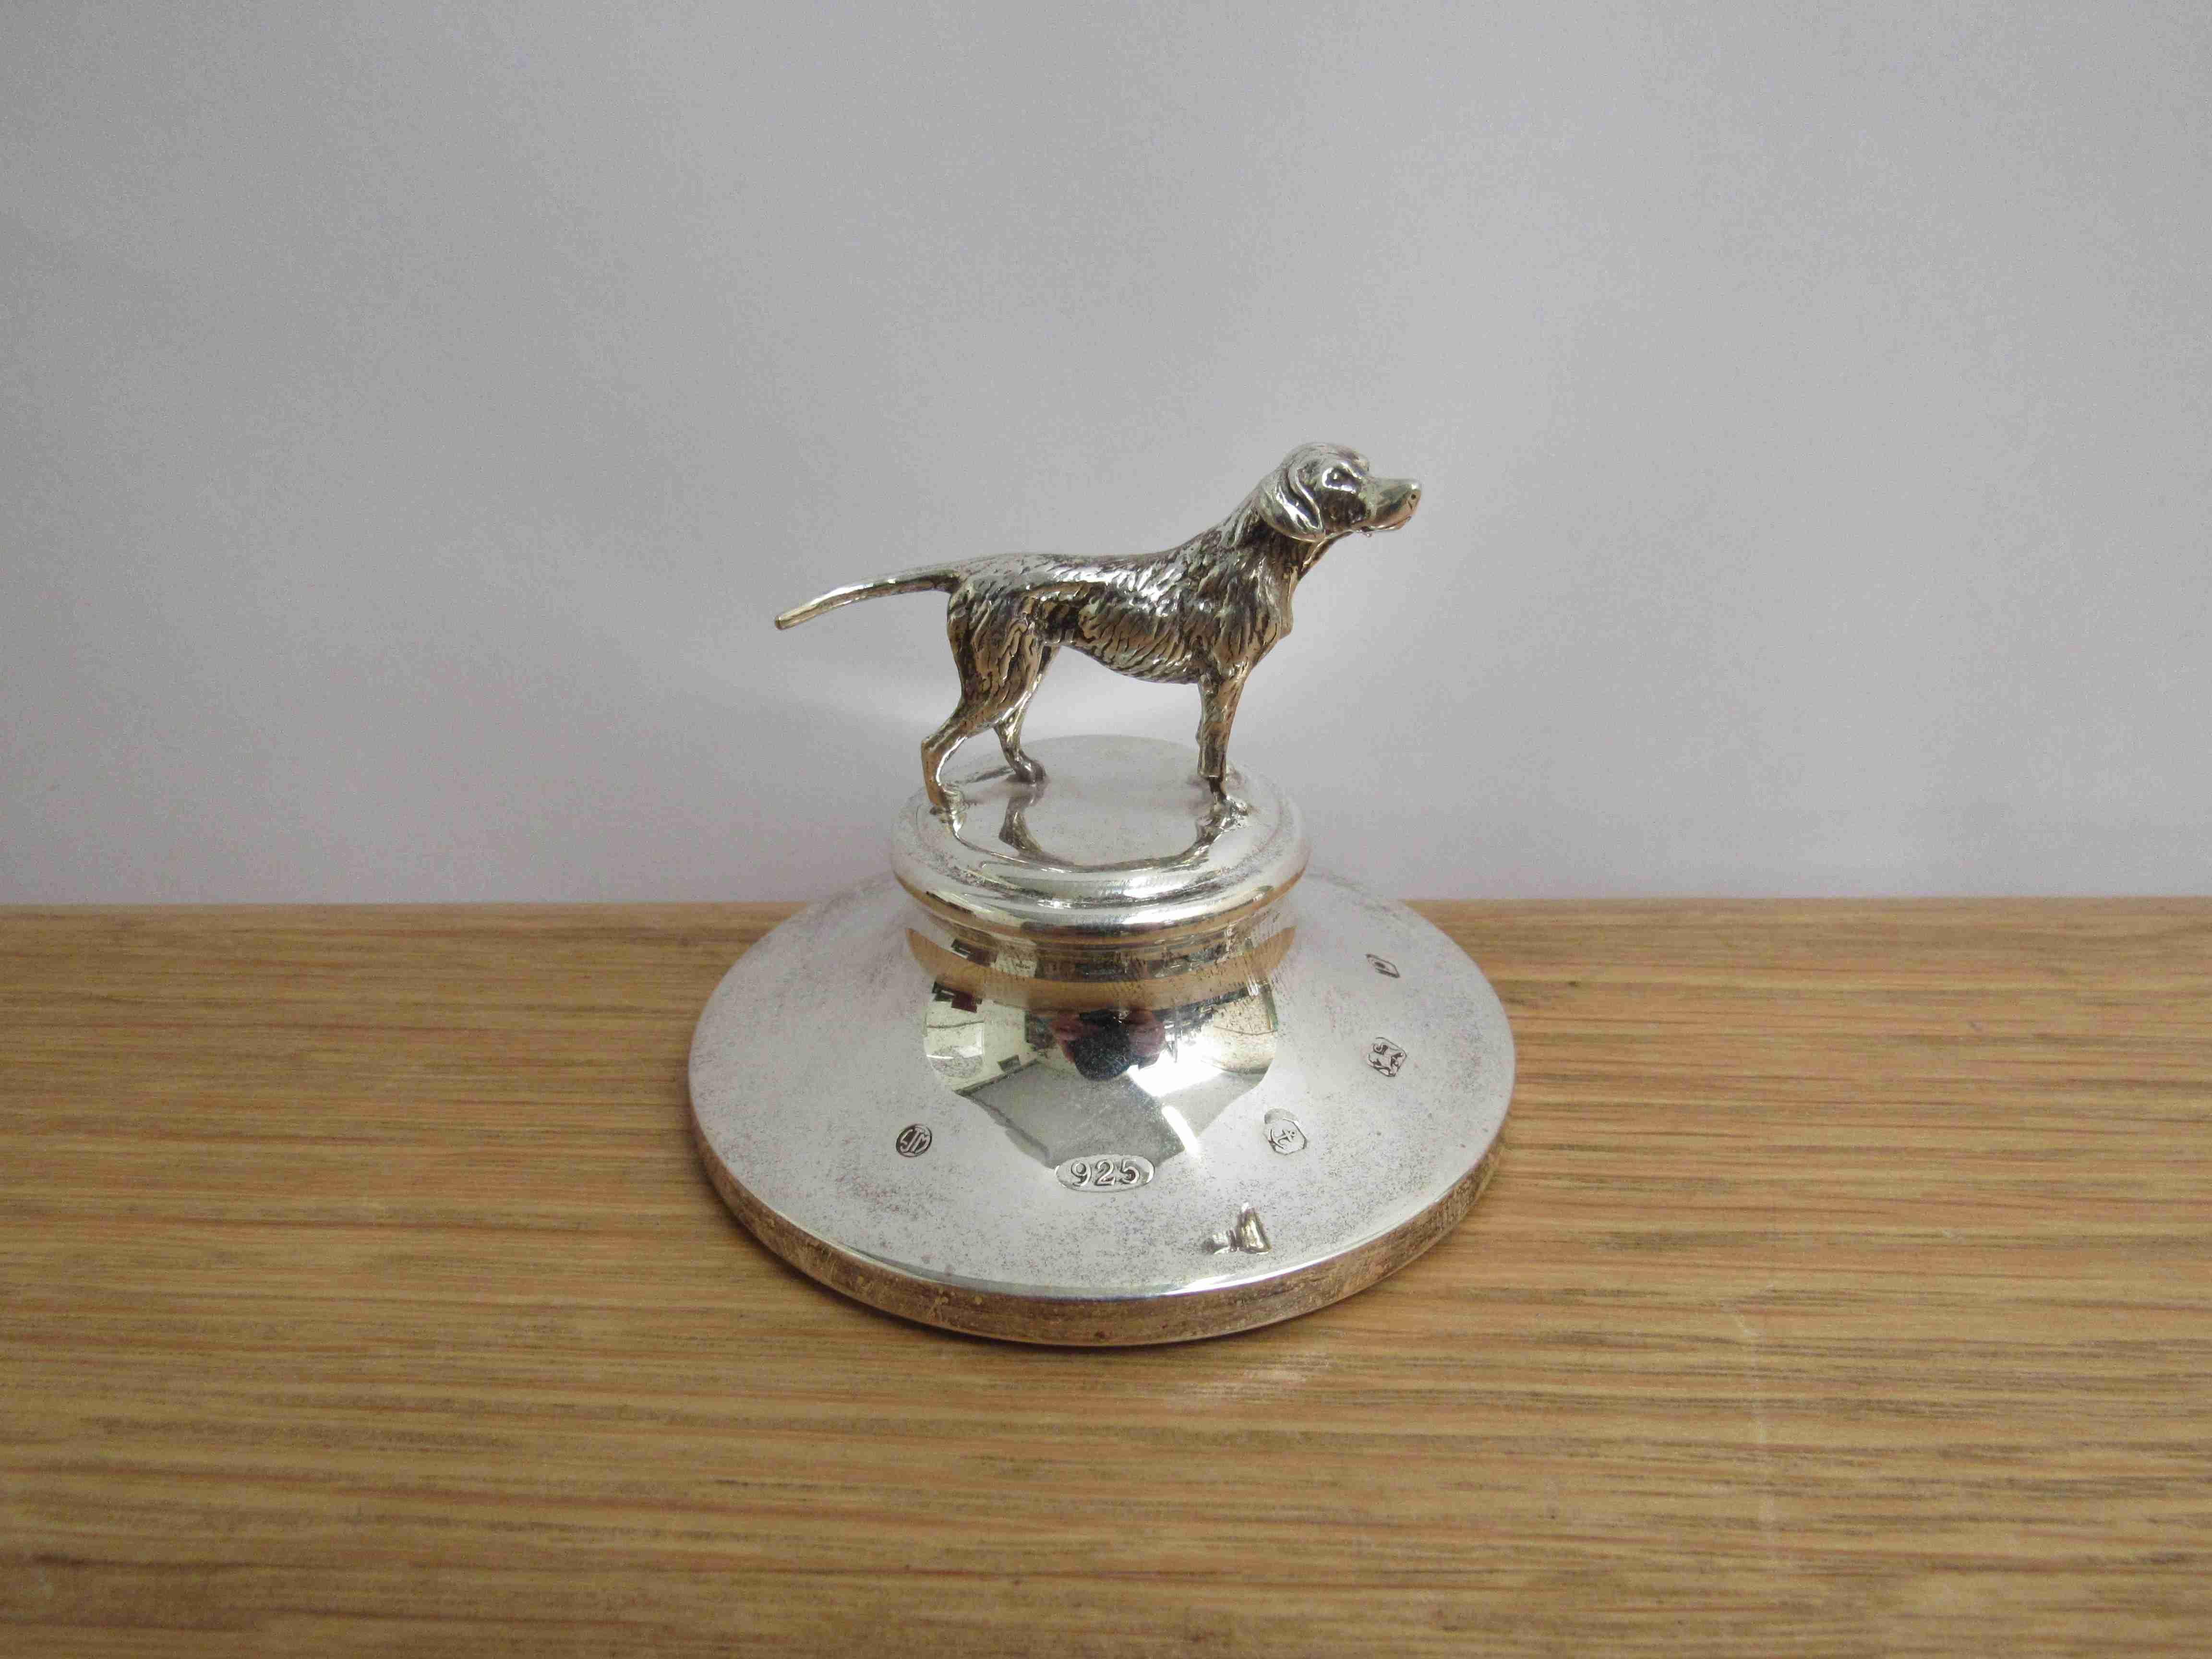 Lot 3 - An L.J. Millington silver desk weight of a Pointer dog, Birmingham 2014, 7.